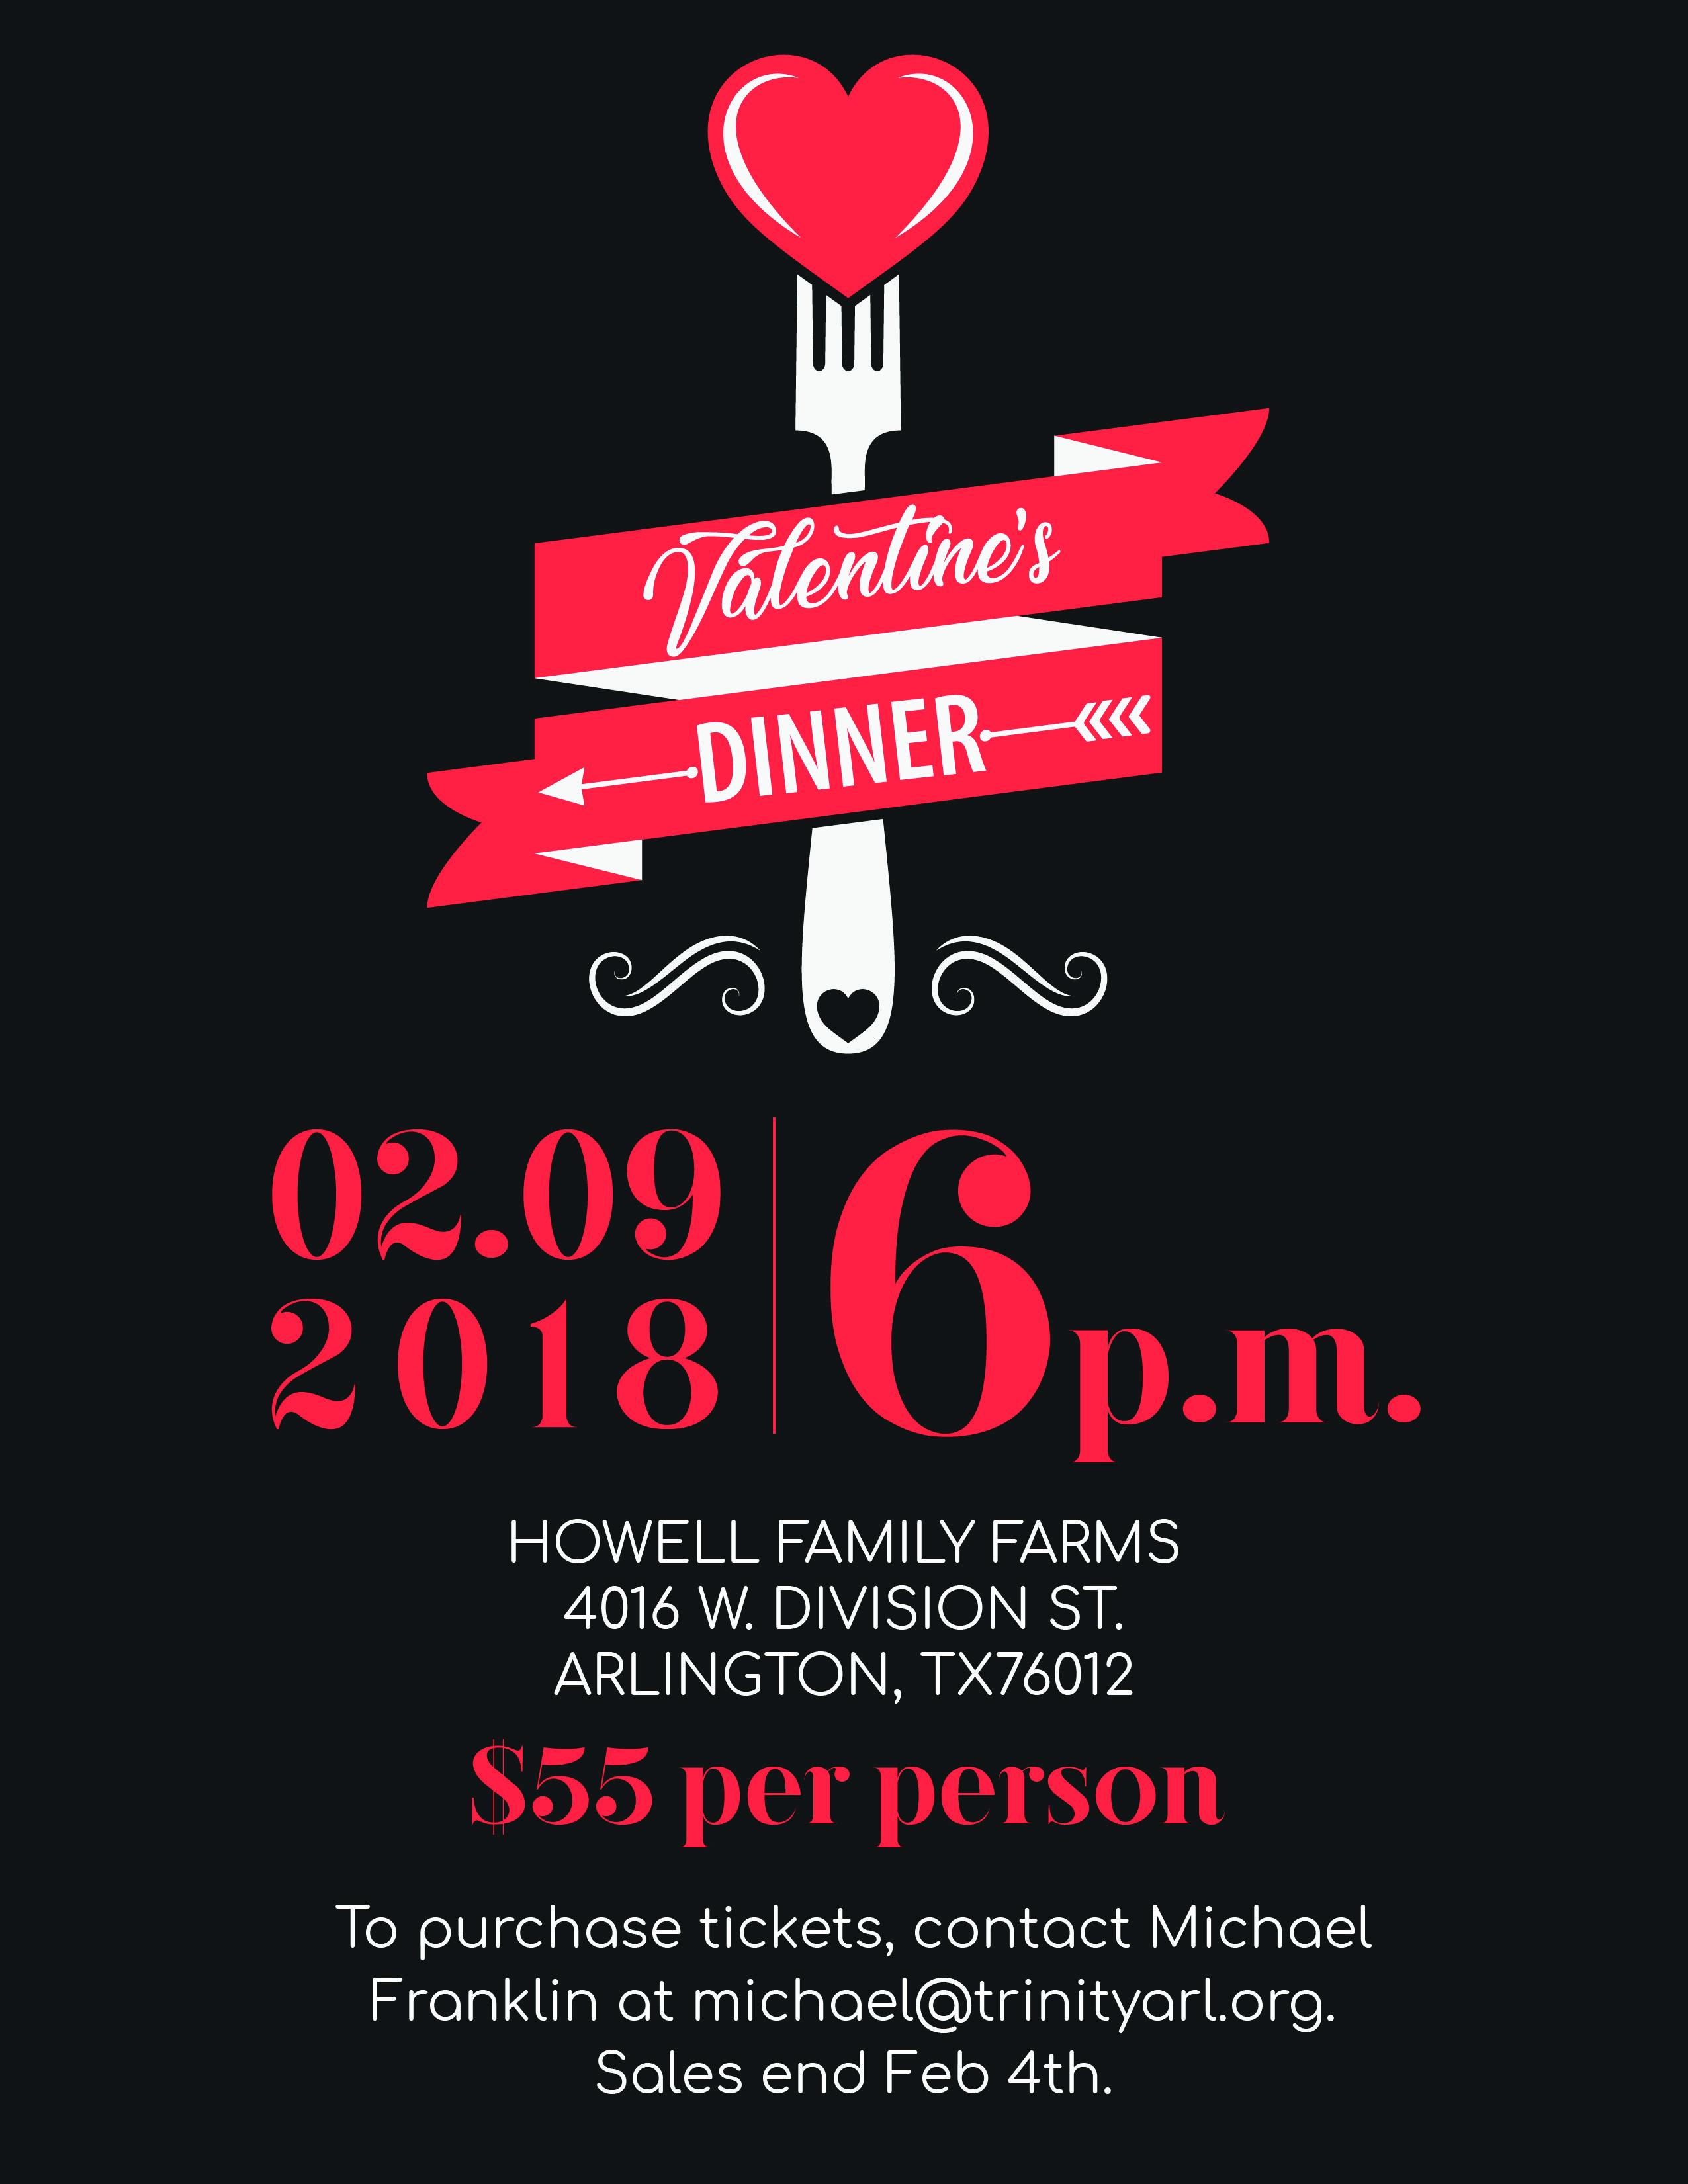 Valentines Dinner Fundraiser Advertisement